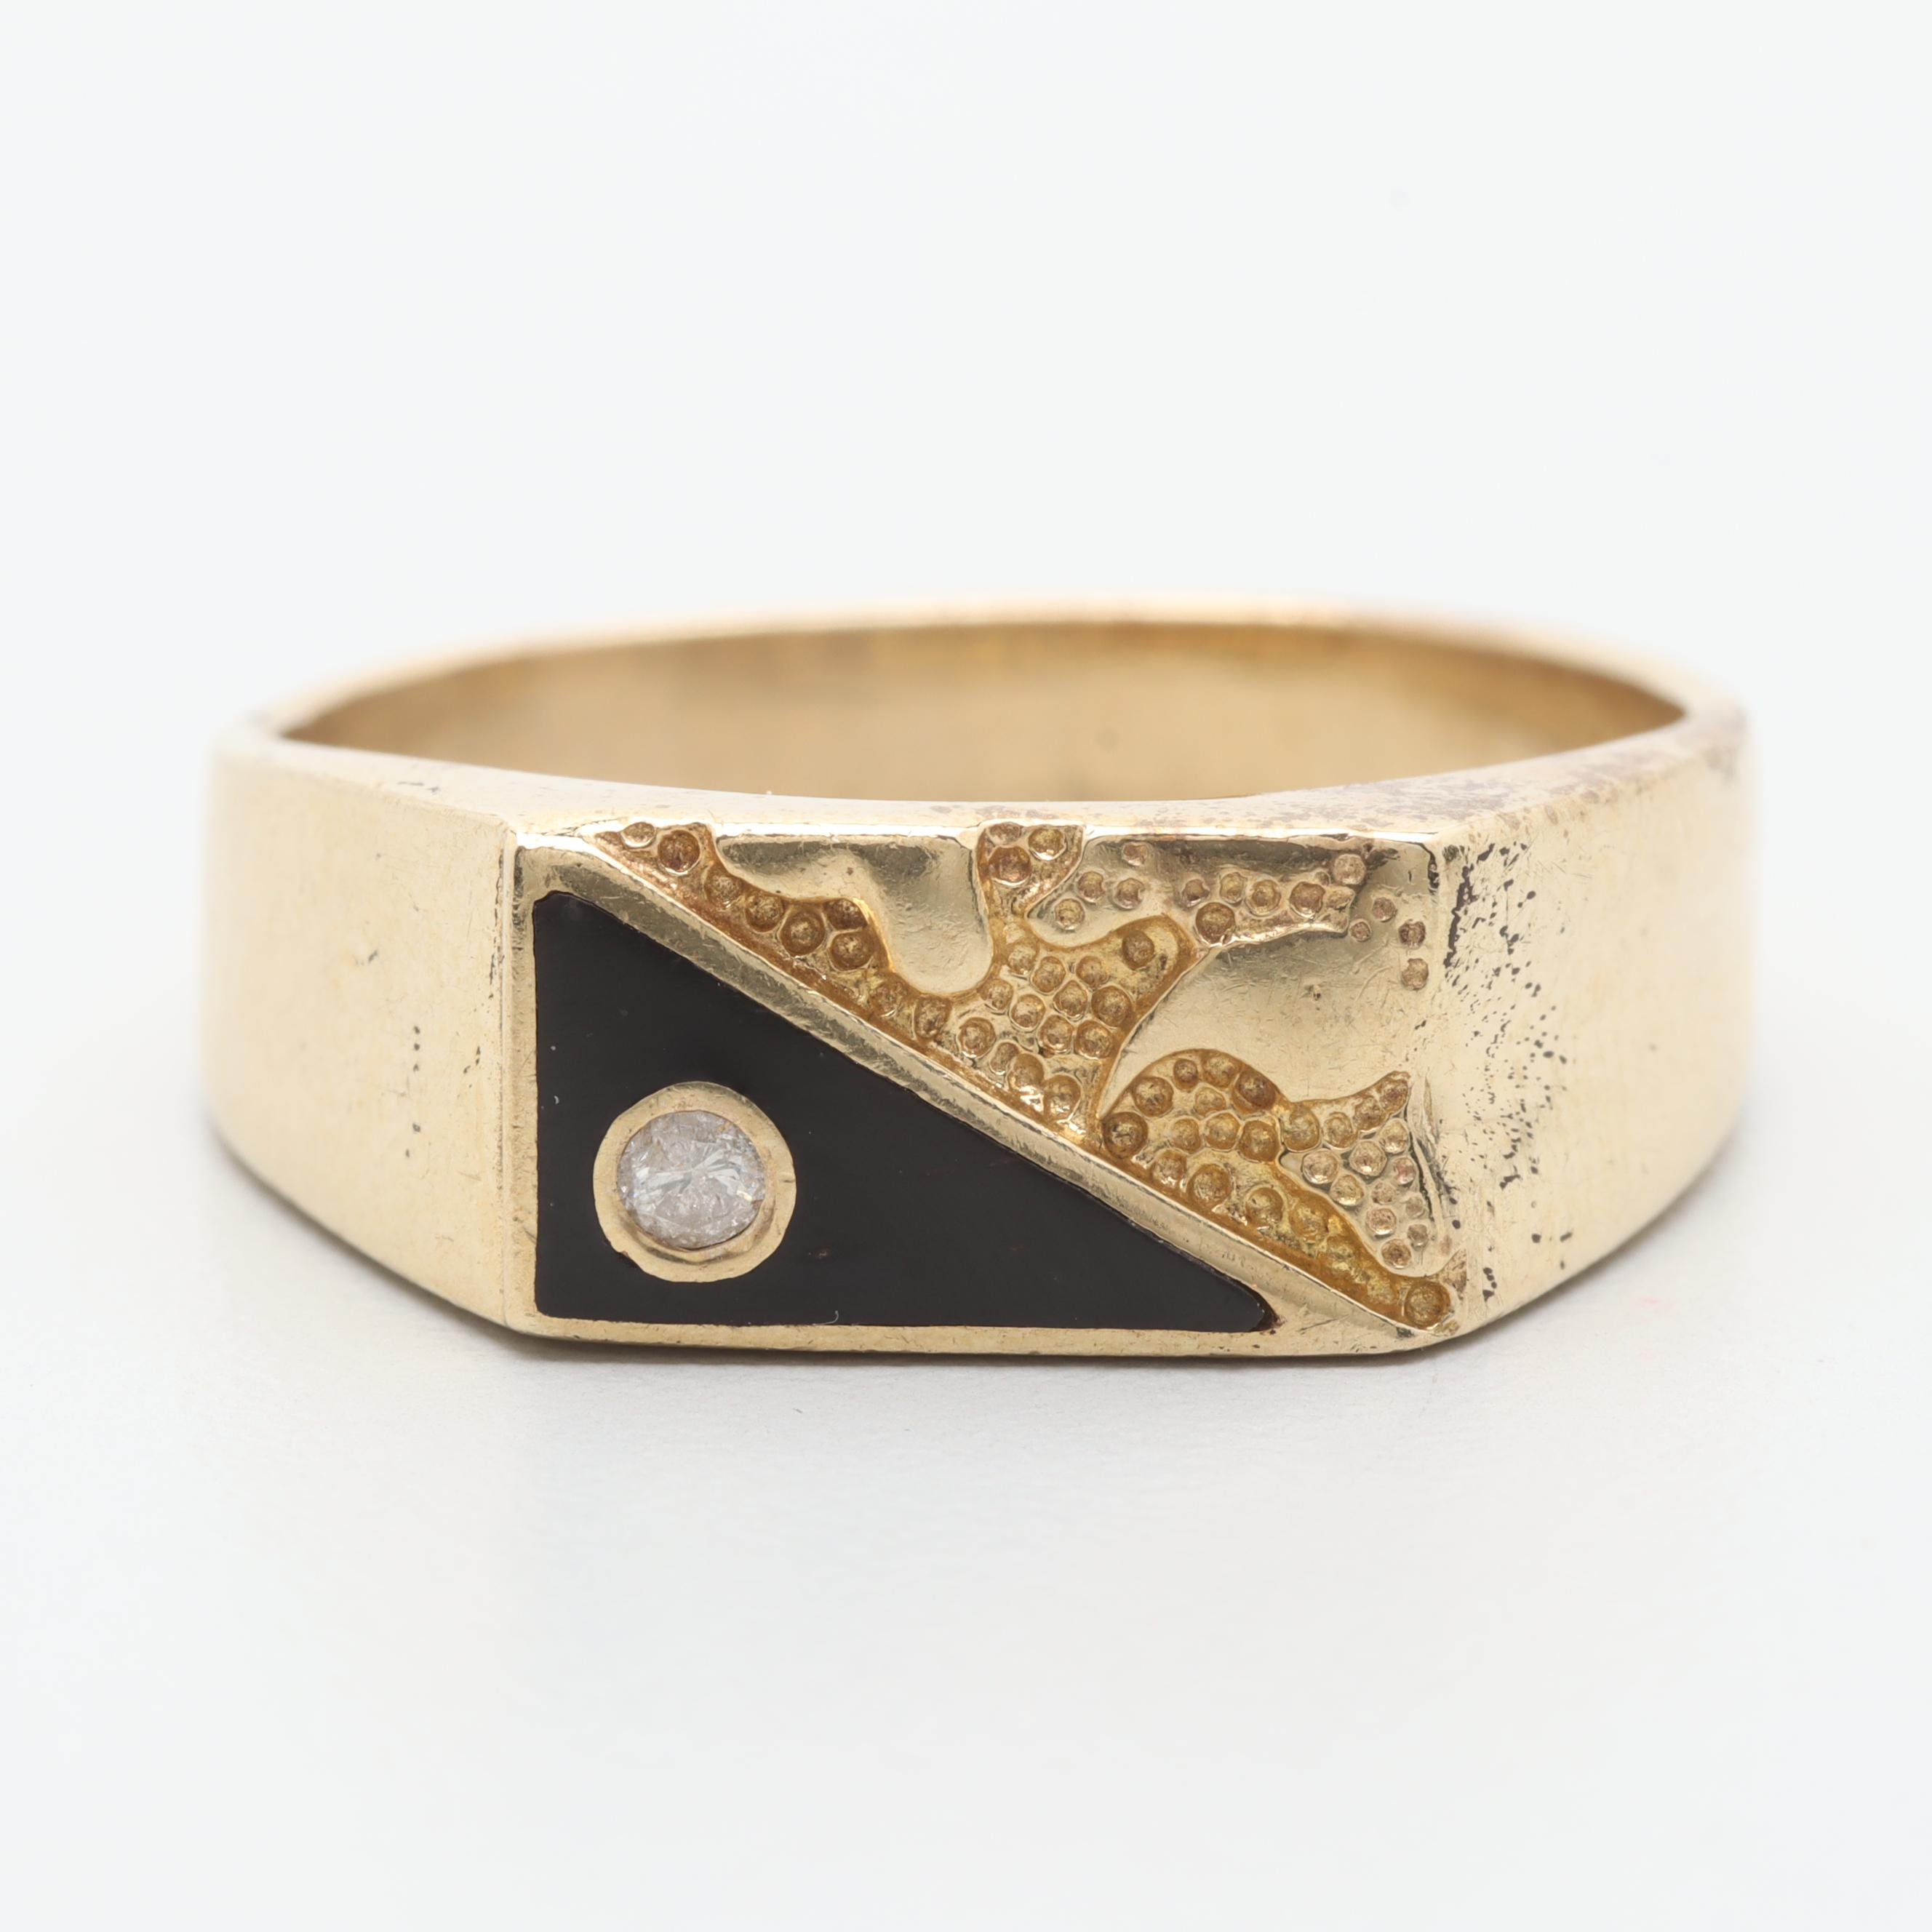 10K Yellow Gold Diamond and Black Enamel Inlay Ring